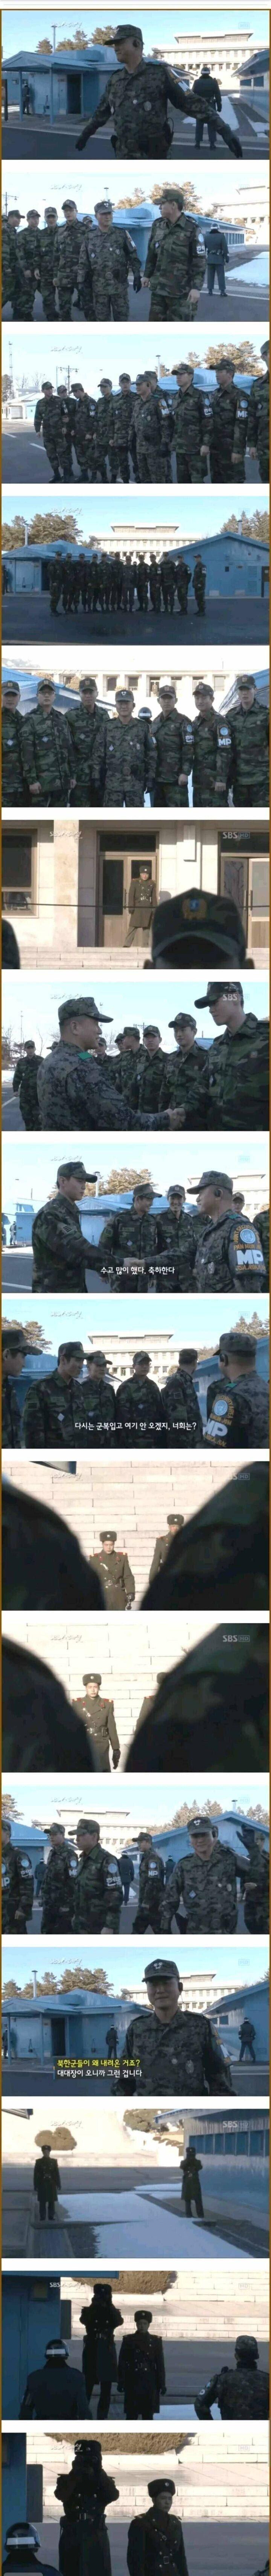 9bcb132ee590127a5e15c3ccc230f245.jpg 북한군 앞에서 전역식하는 국군.jpg